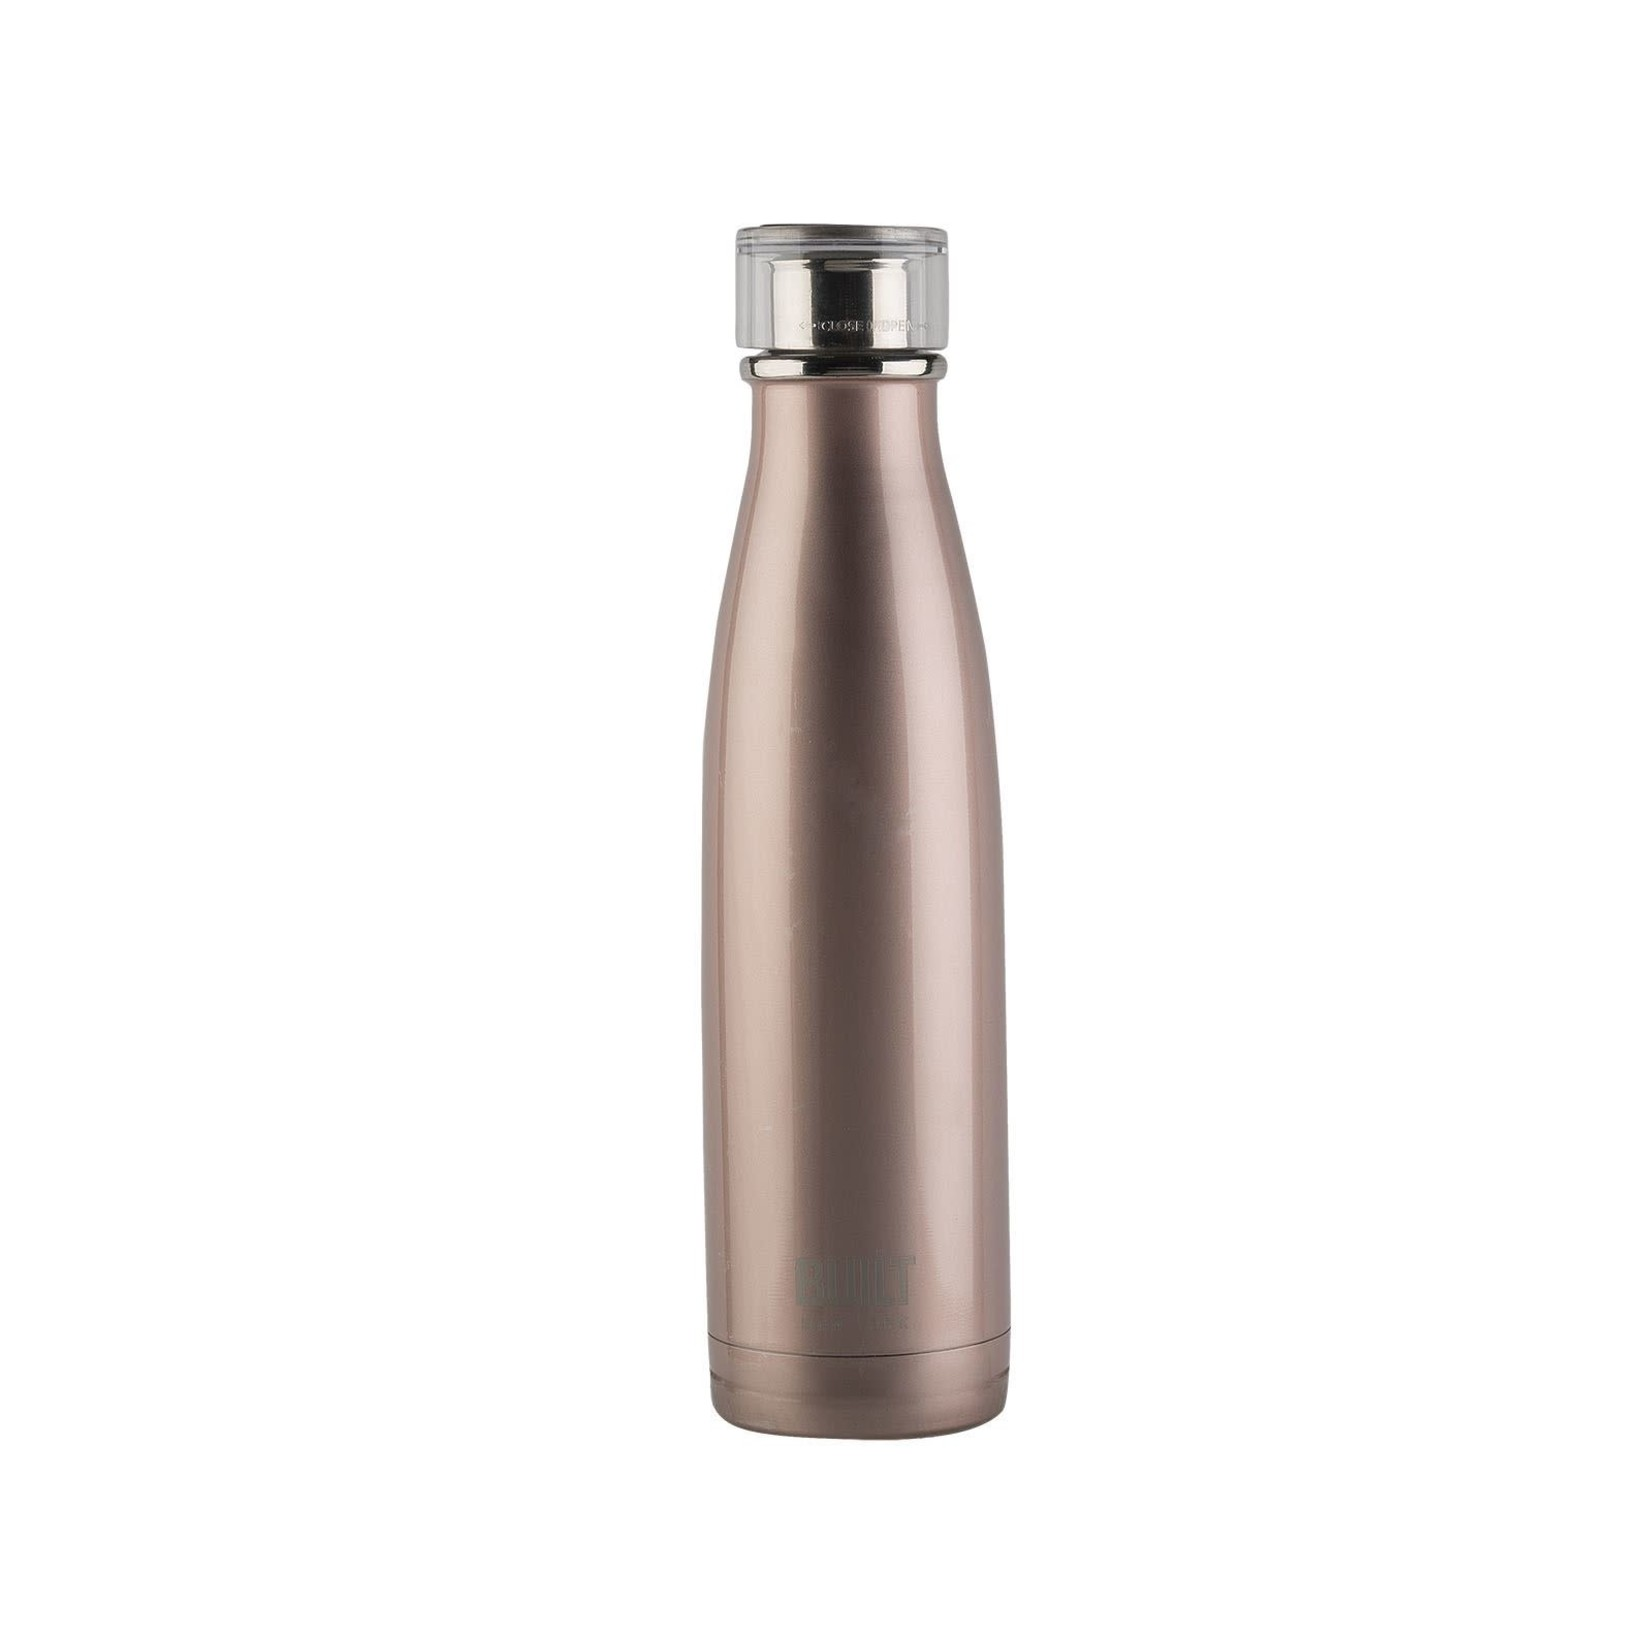 Built Isolerende lekvrije drinkfles 0,5L RVS roze-goud